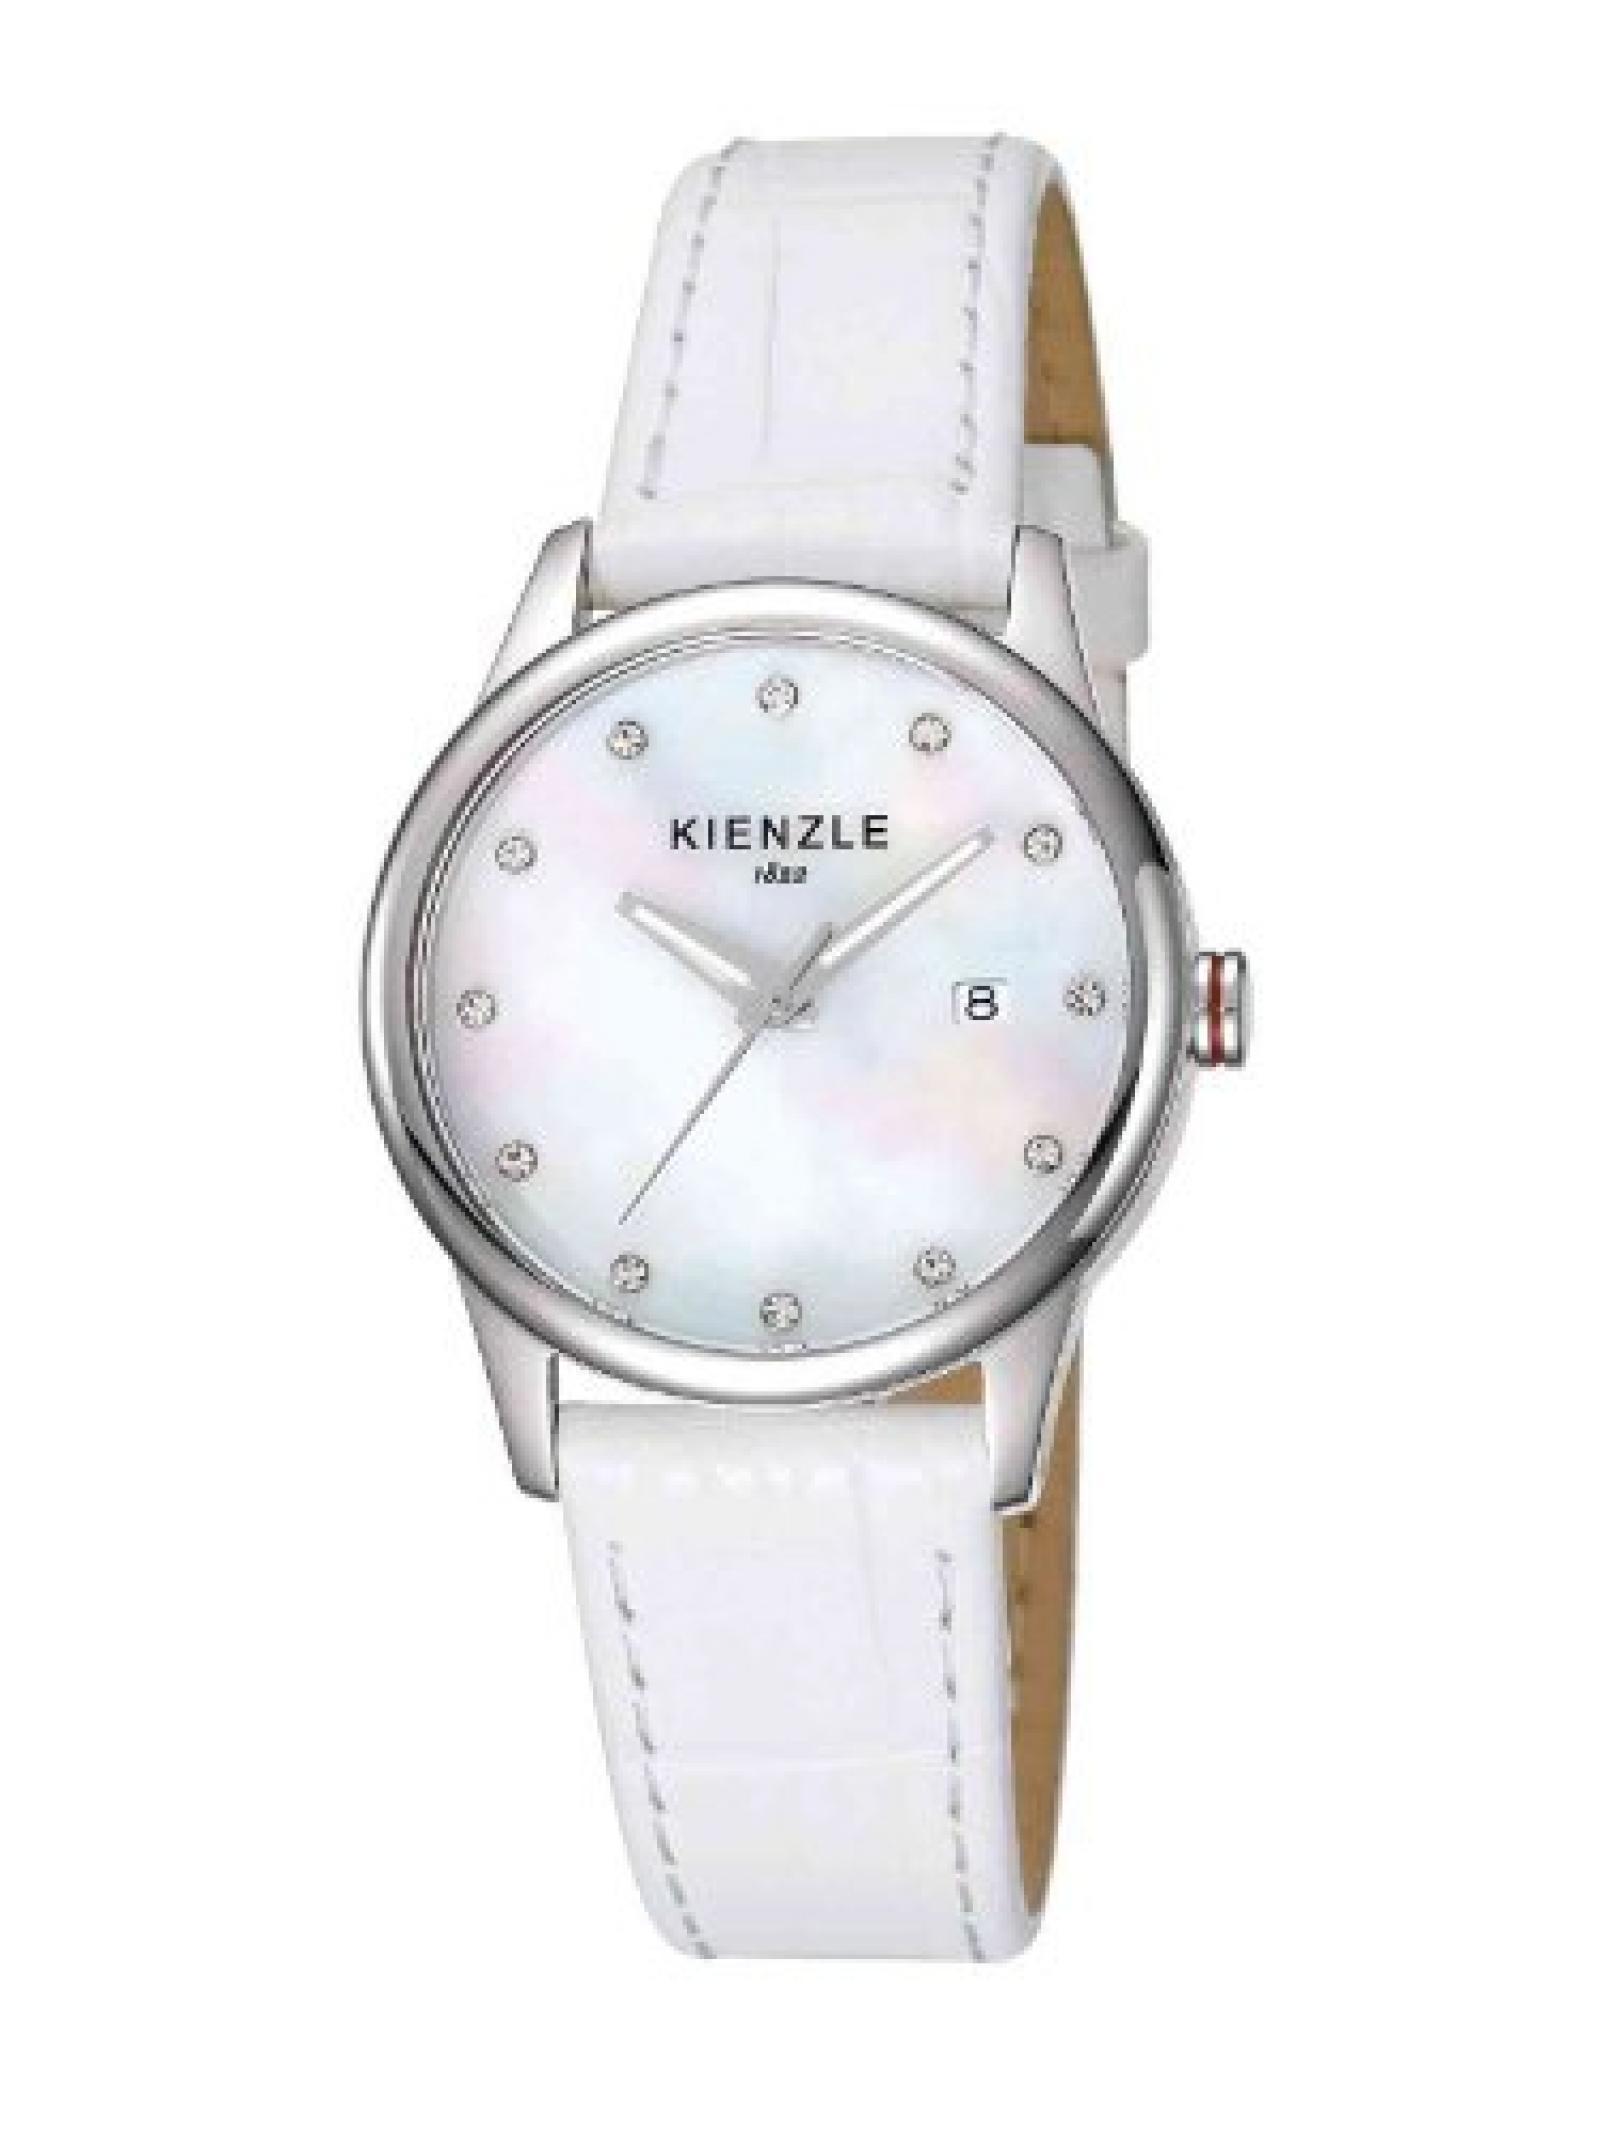 Kienzle Damen-Armbanduhr XS Analog Leder K3042014061